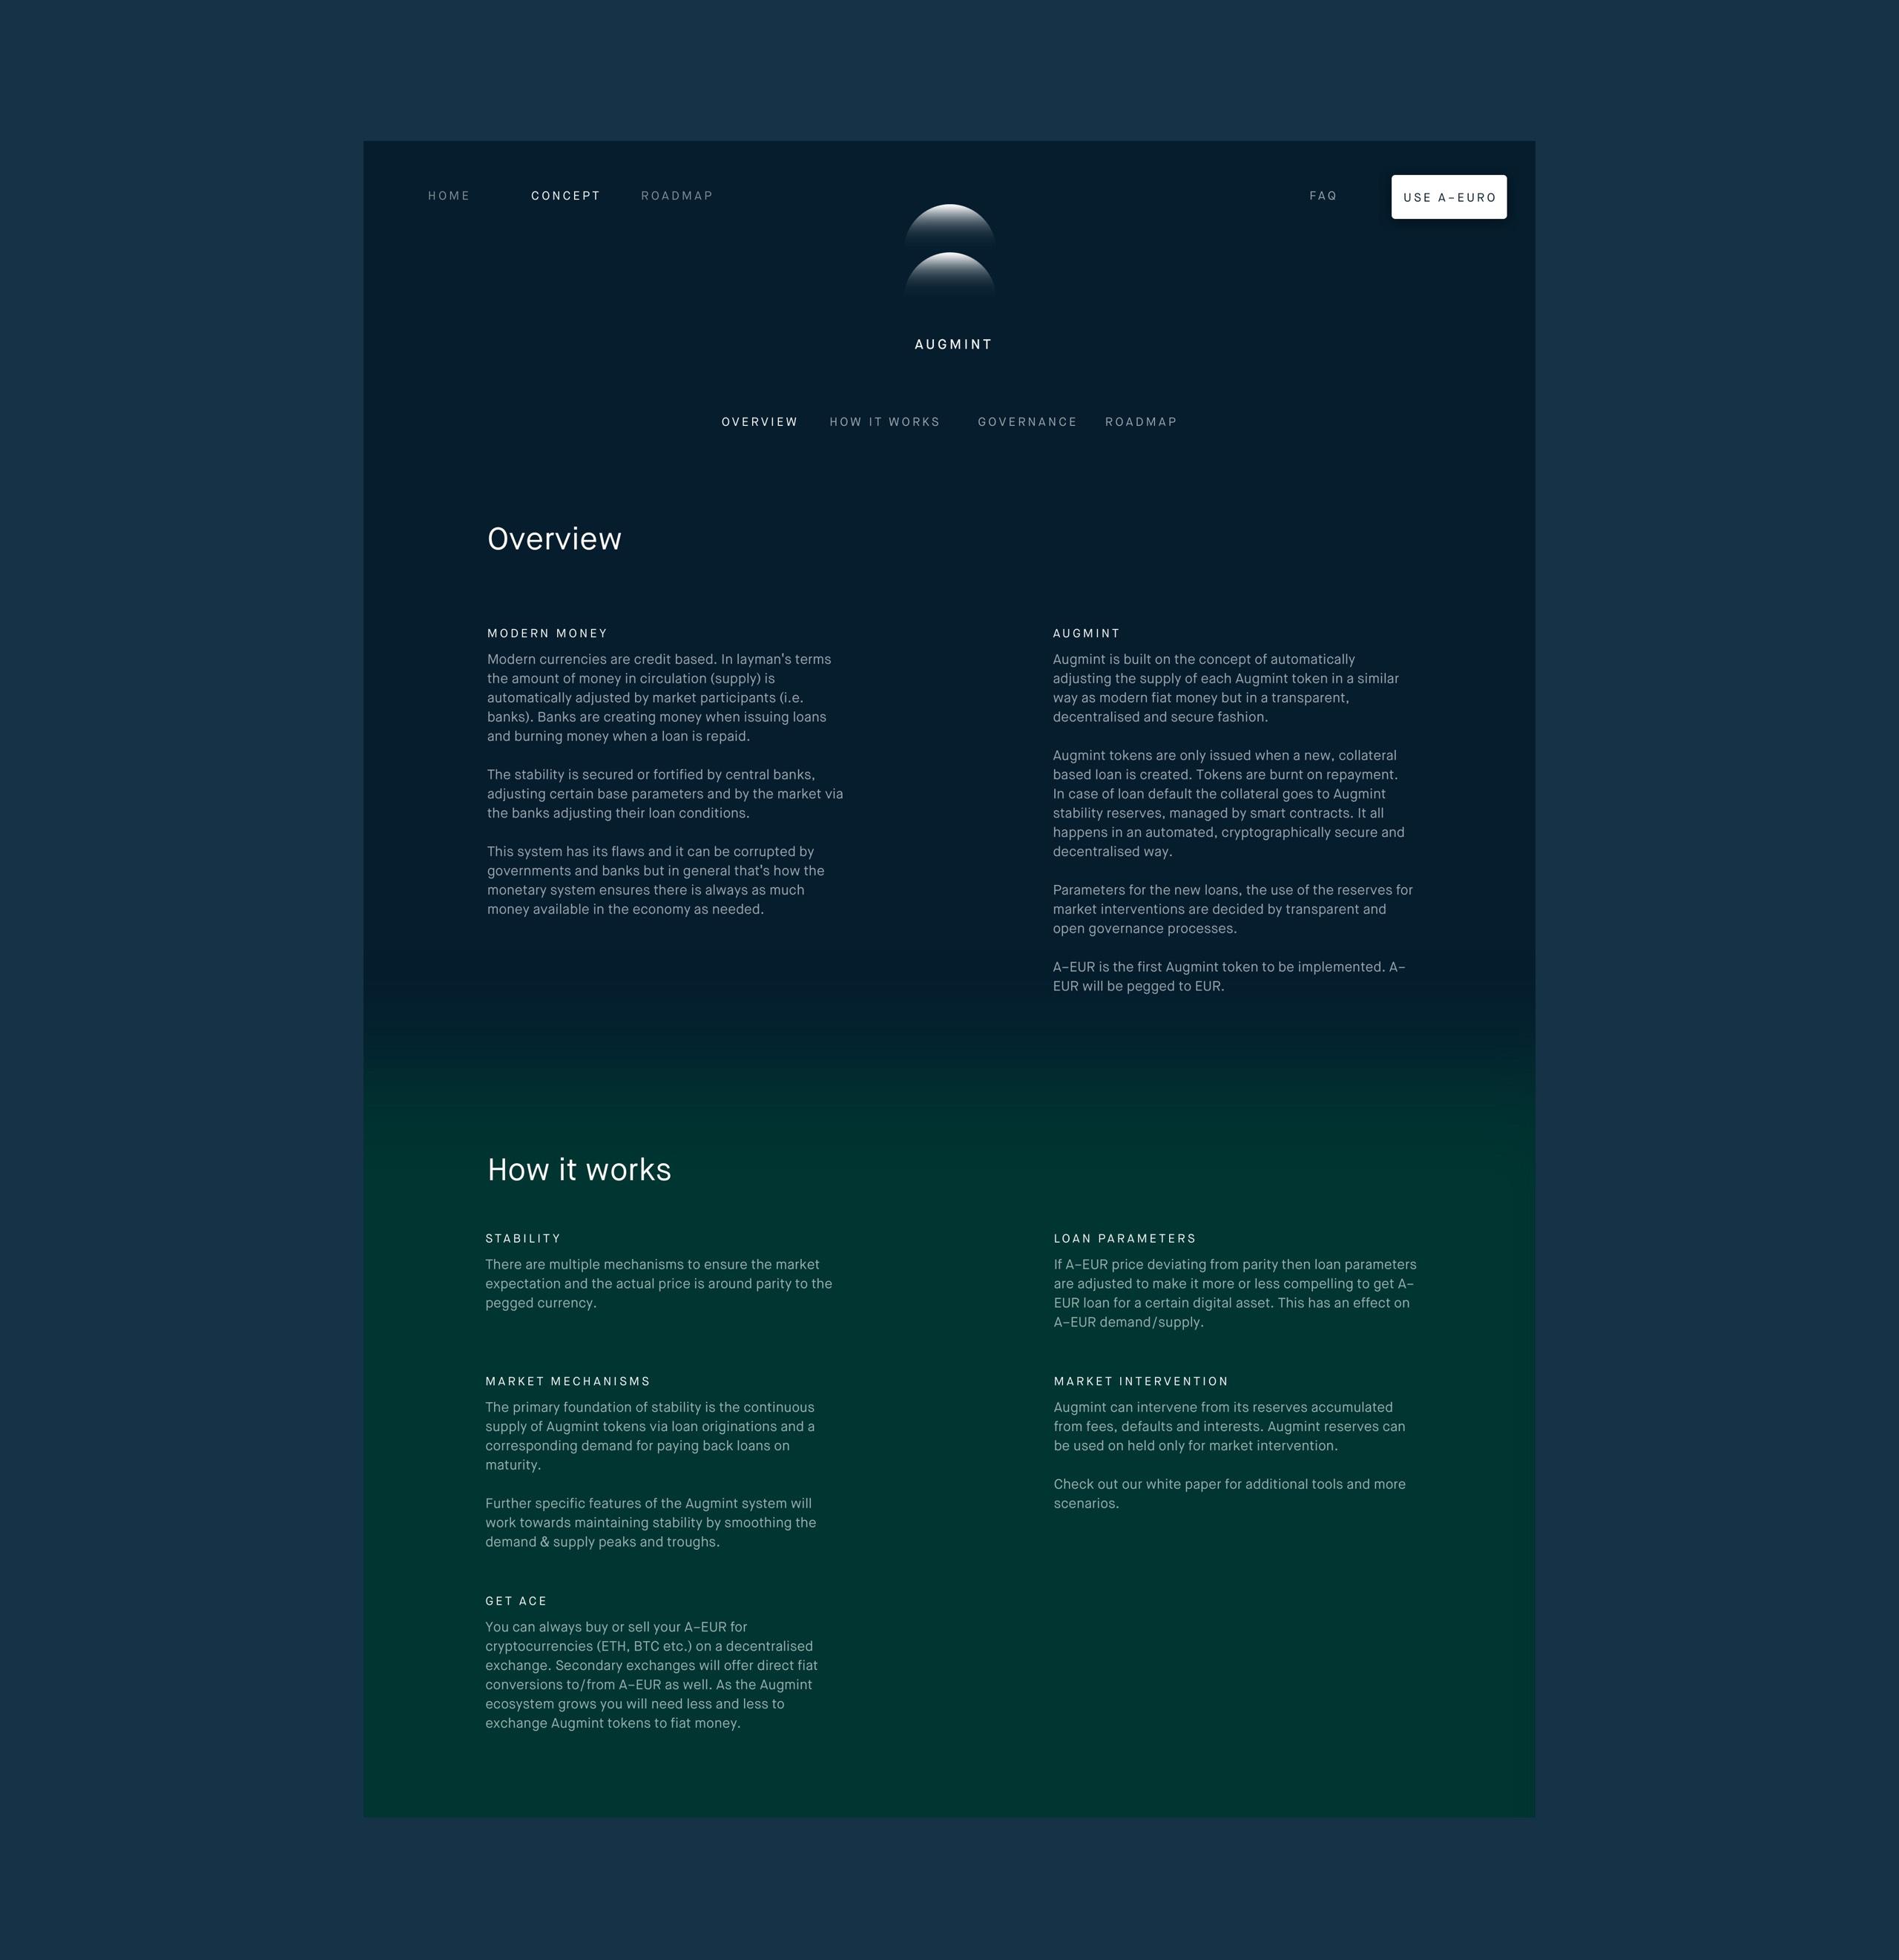 augmint_website_concept_v2